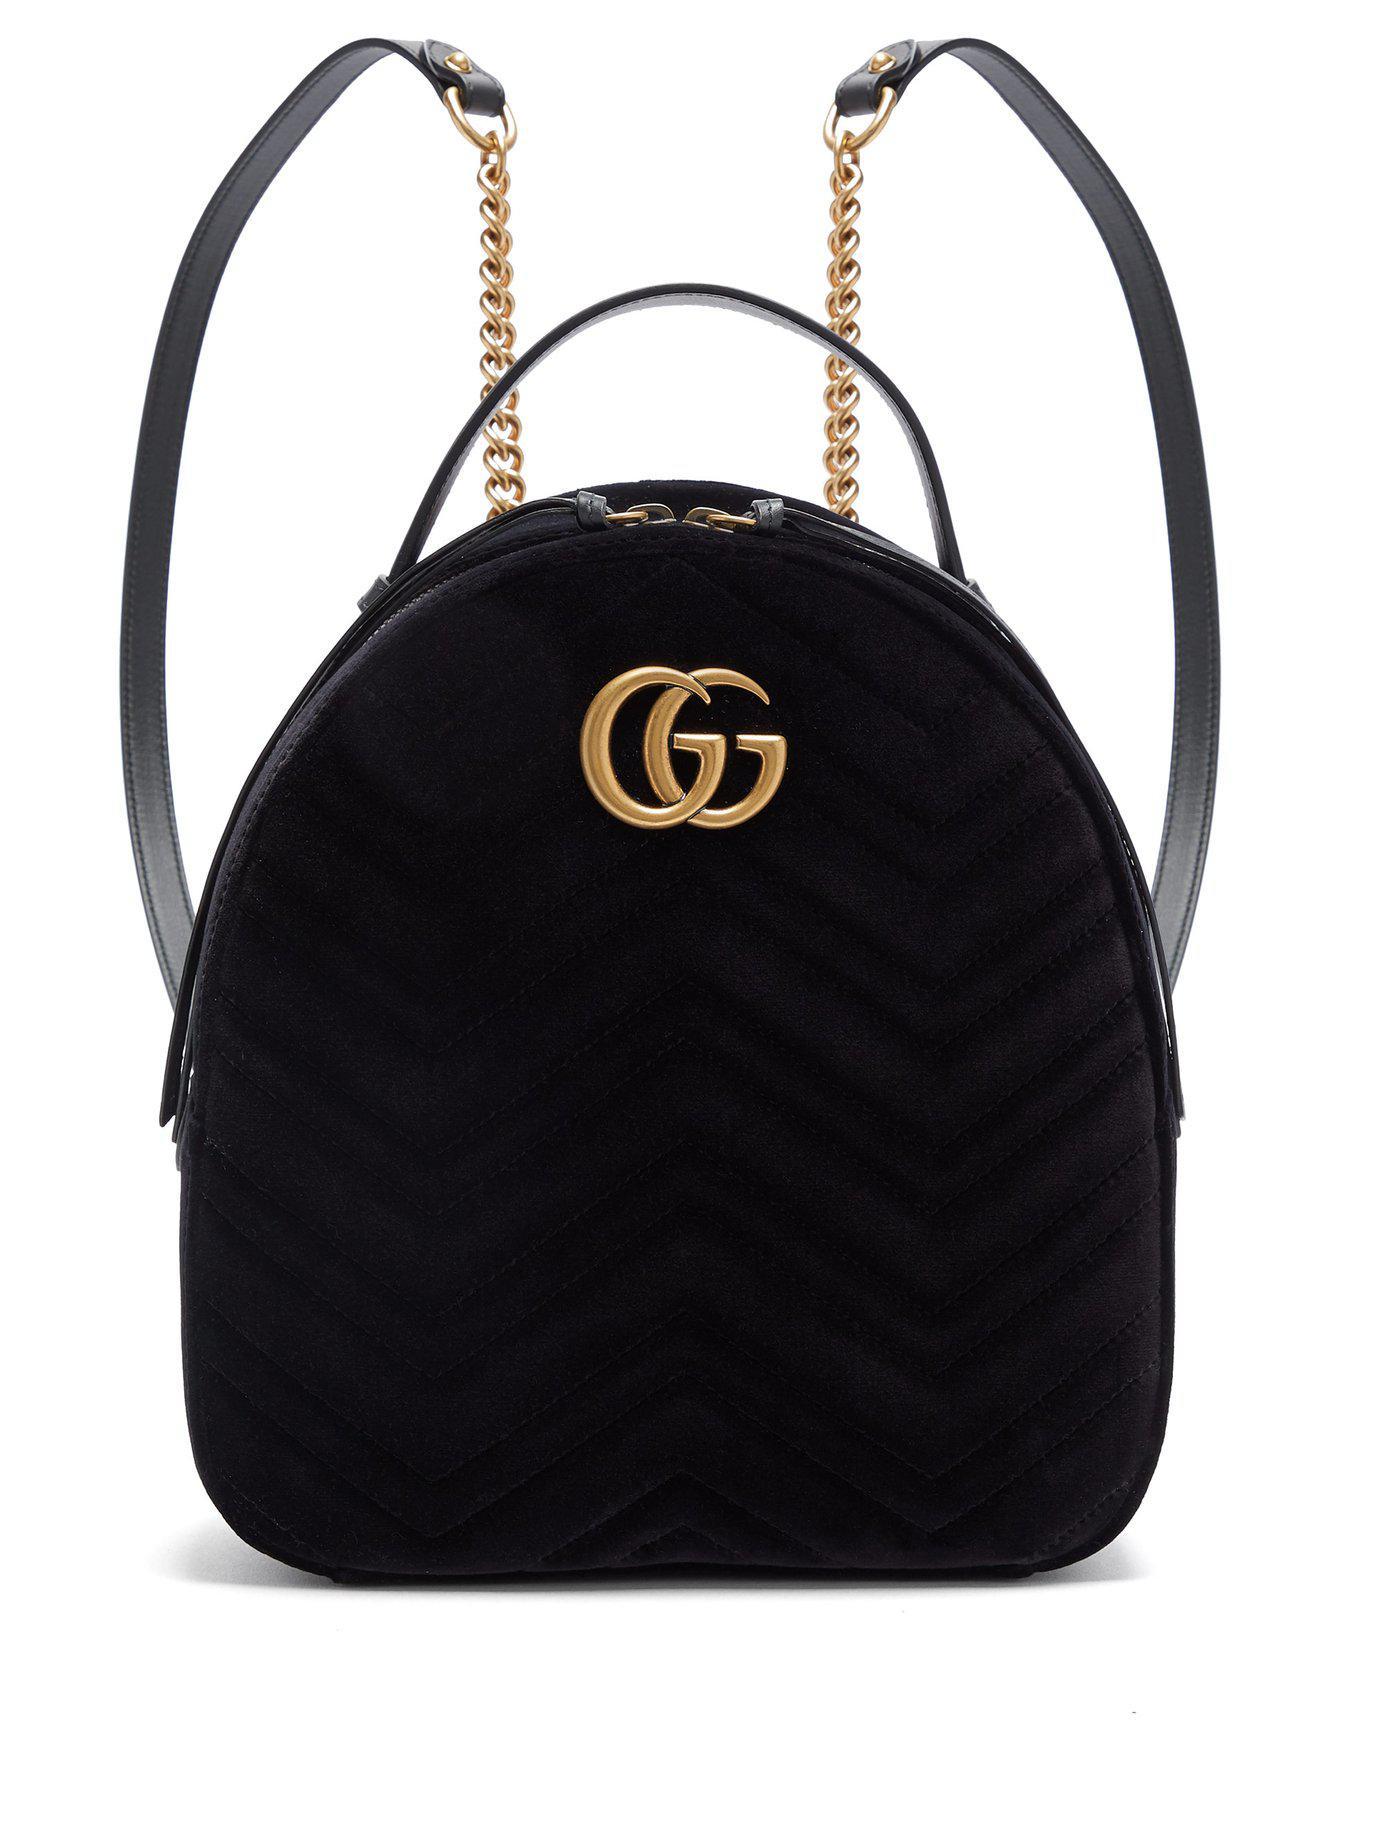 Lyst - Gucci Gg Marmont Velvet Backpack in Black 7a31b771b1e85